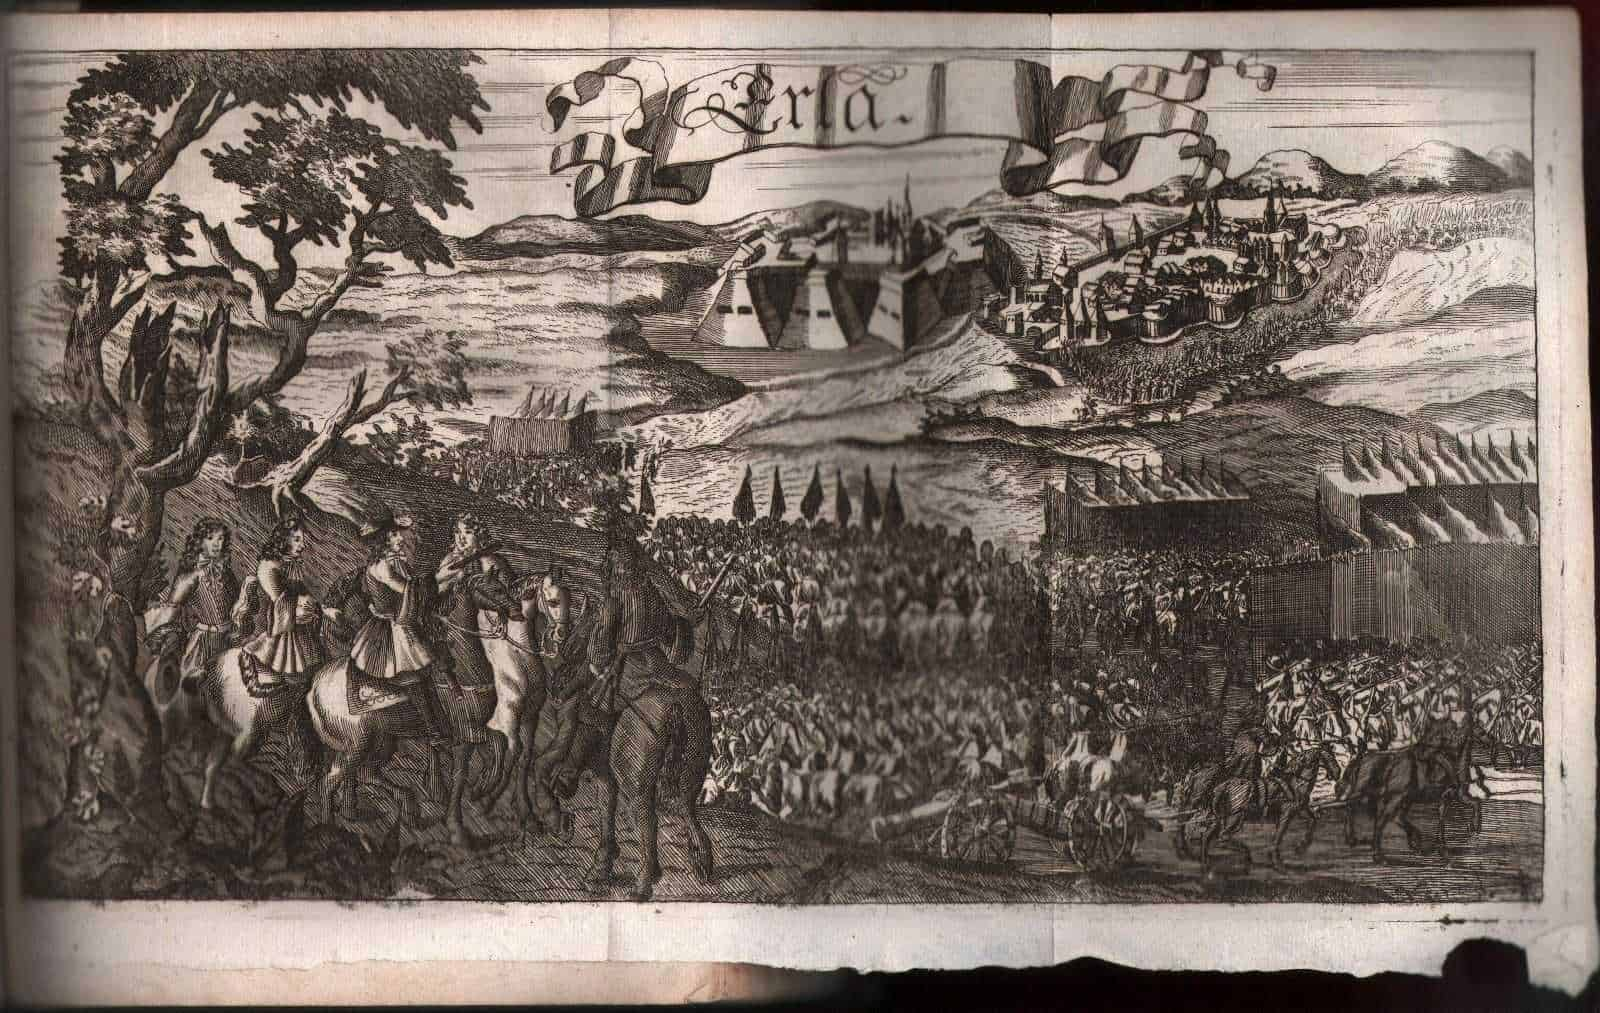 1688-Boethius-TRIUMPH-LEUCHTENDEN-KRIEGS-HELMS-Vol-3-History-Christian-Ottoman-401133054023-8